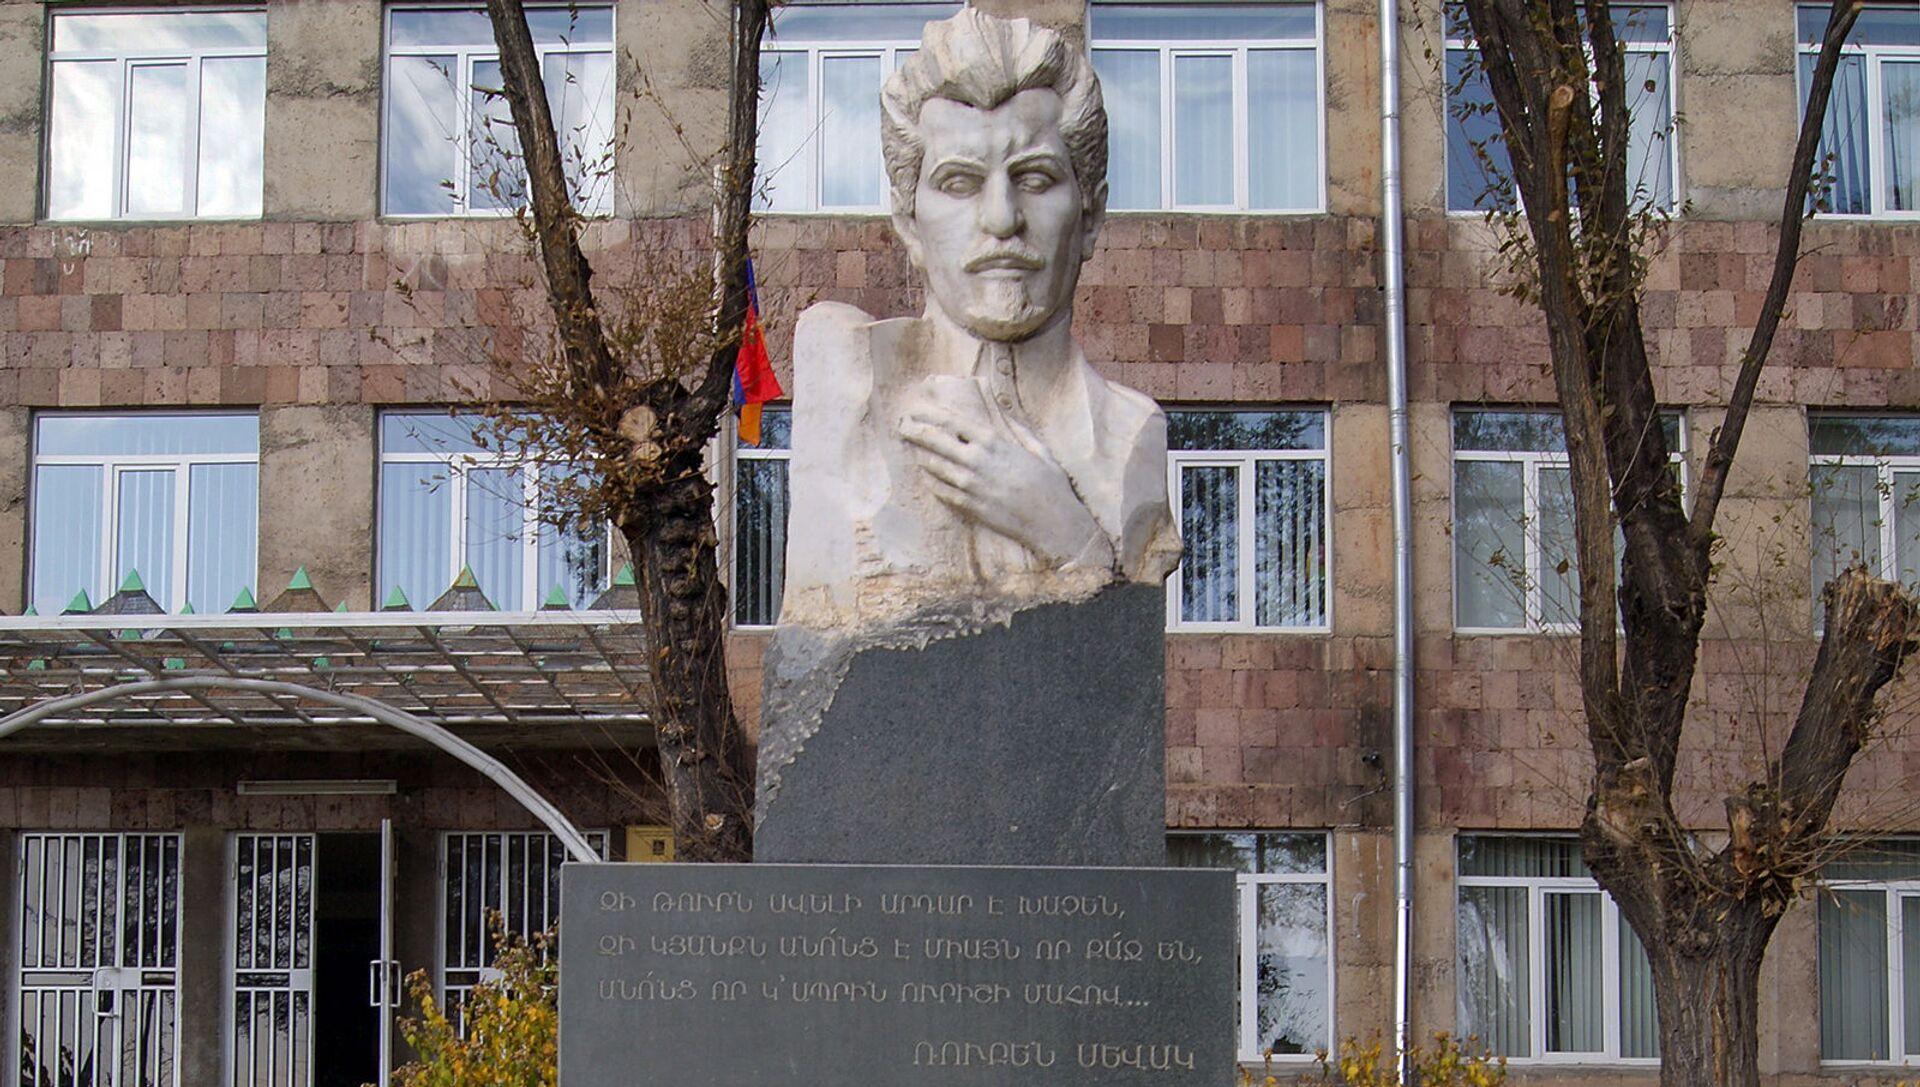 El busto de Rubén Sevak - Sputnik Mundo, 1920, 24.04.2020